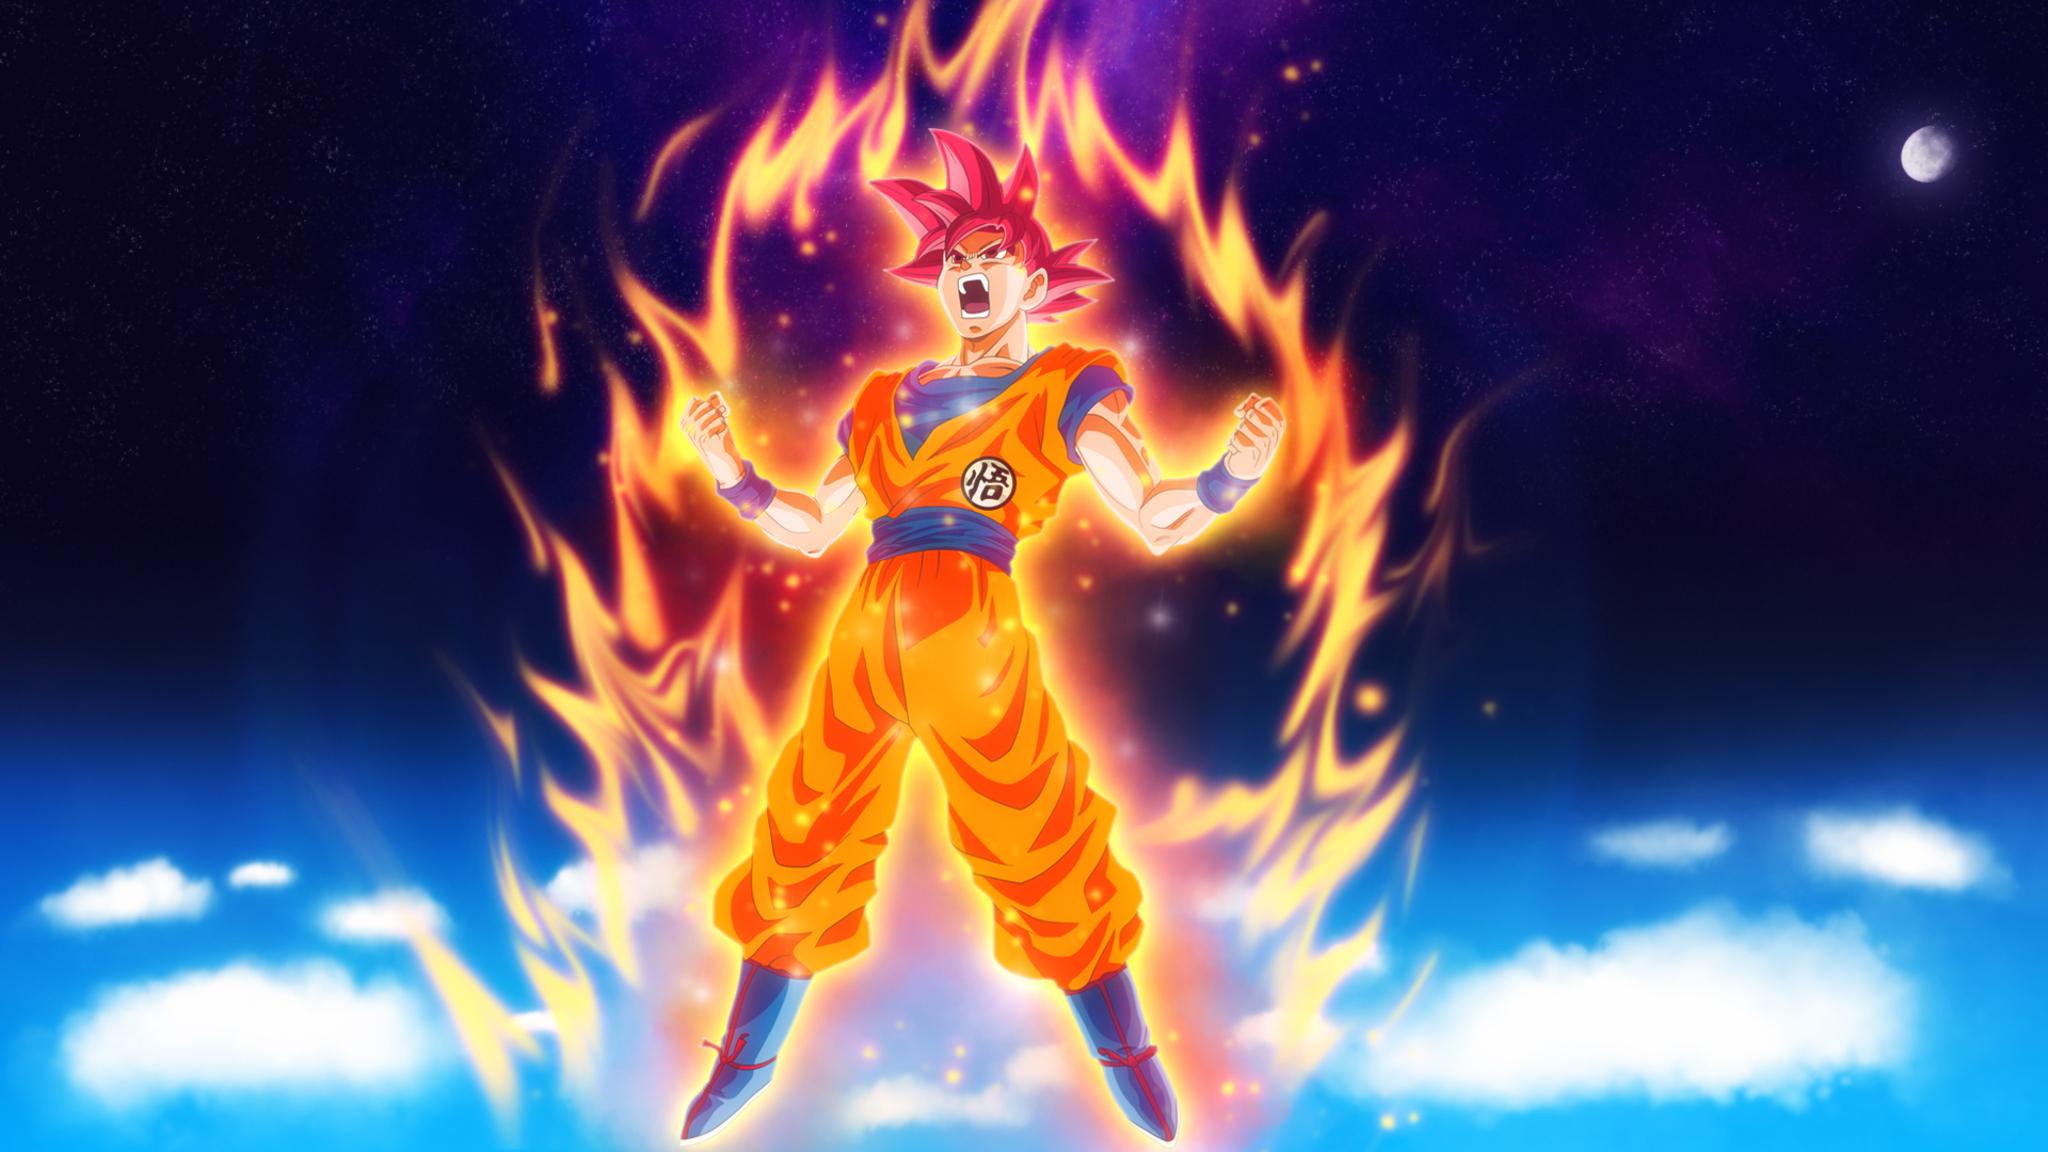 2048x1152 Goku Dragon Ball Super Anime Hd 2048x1152